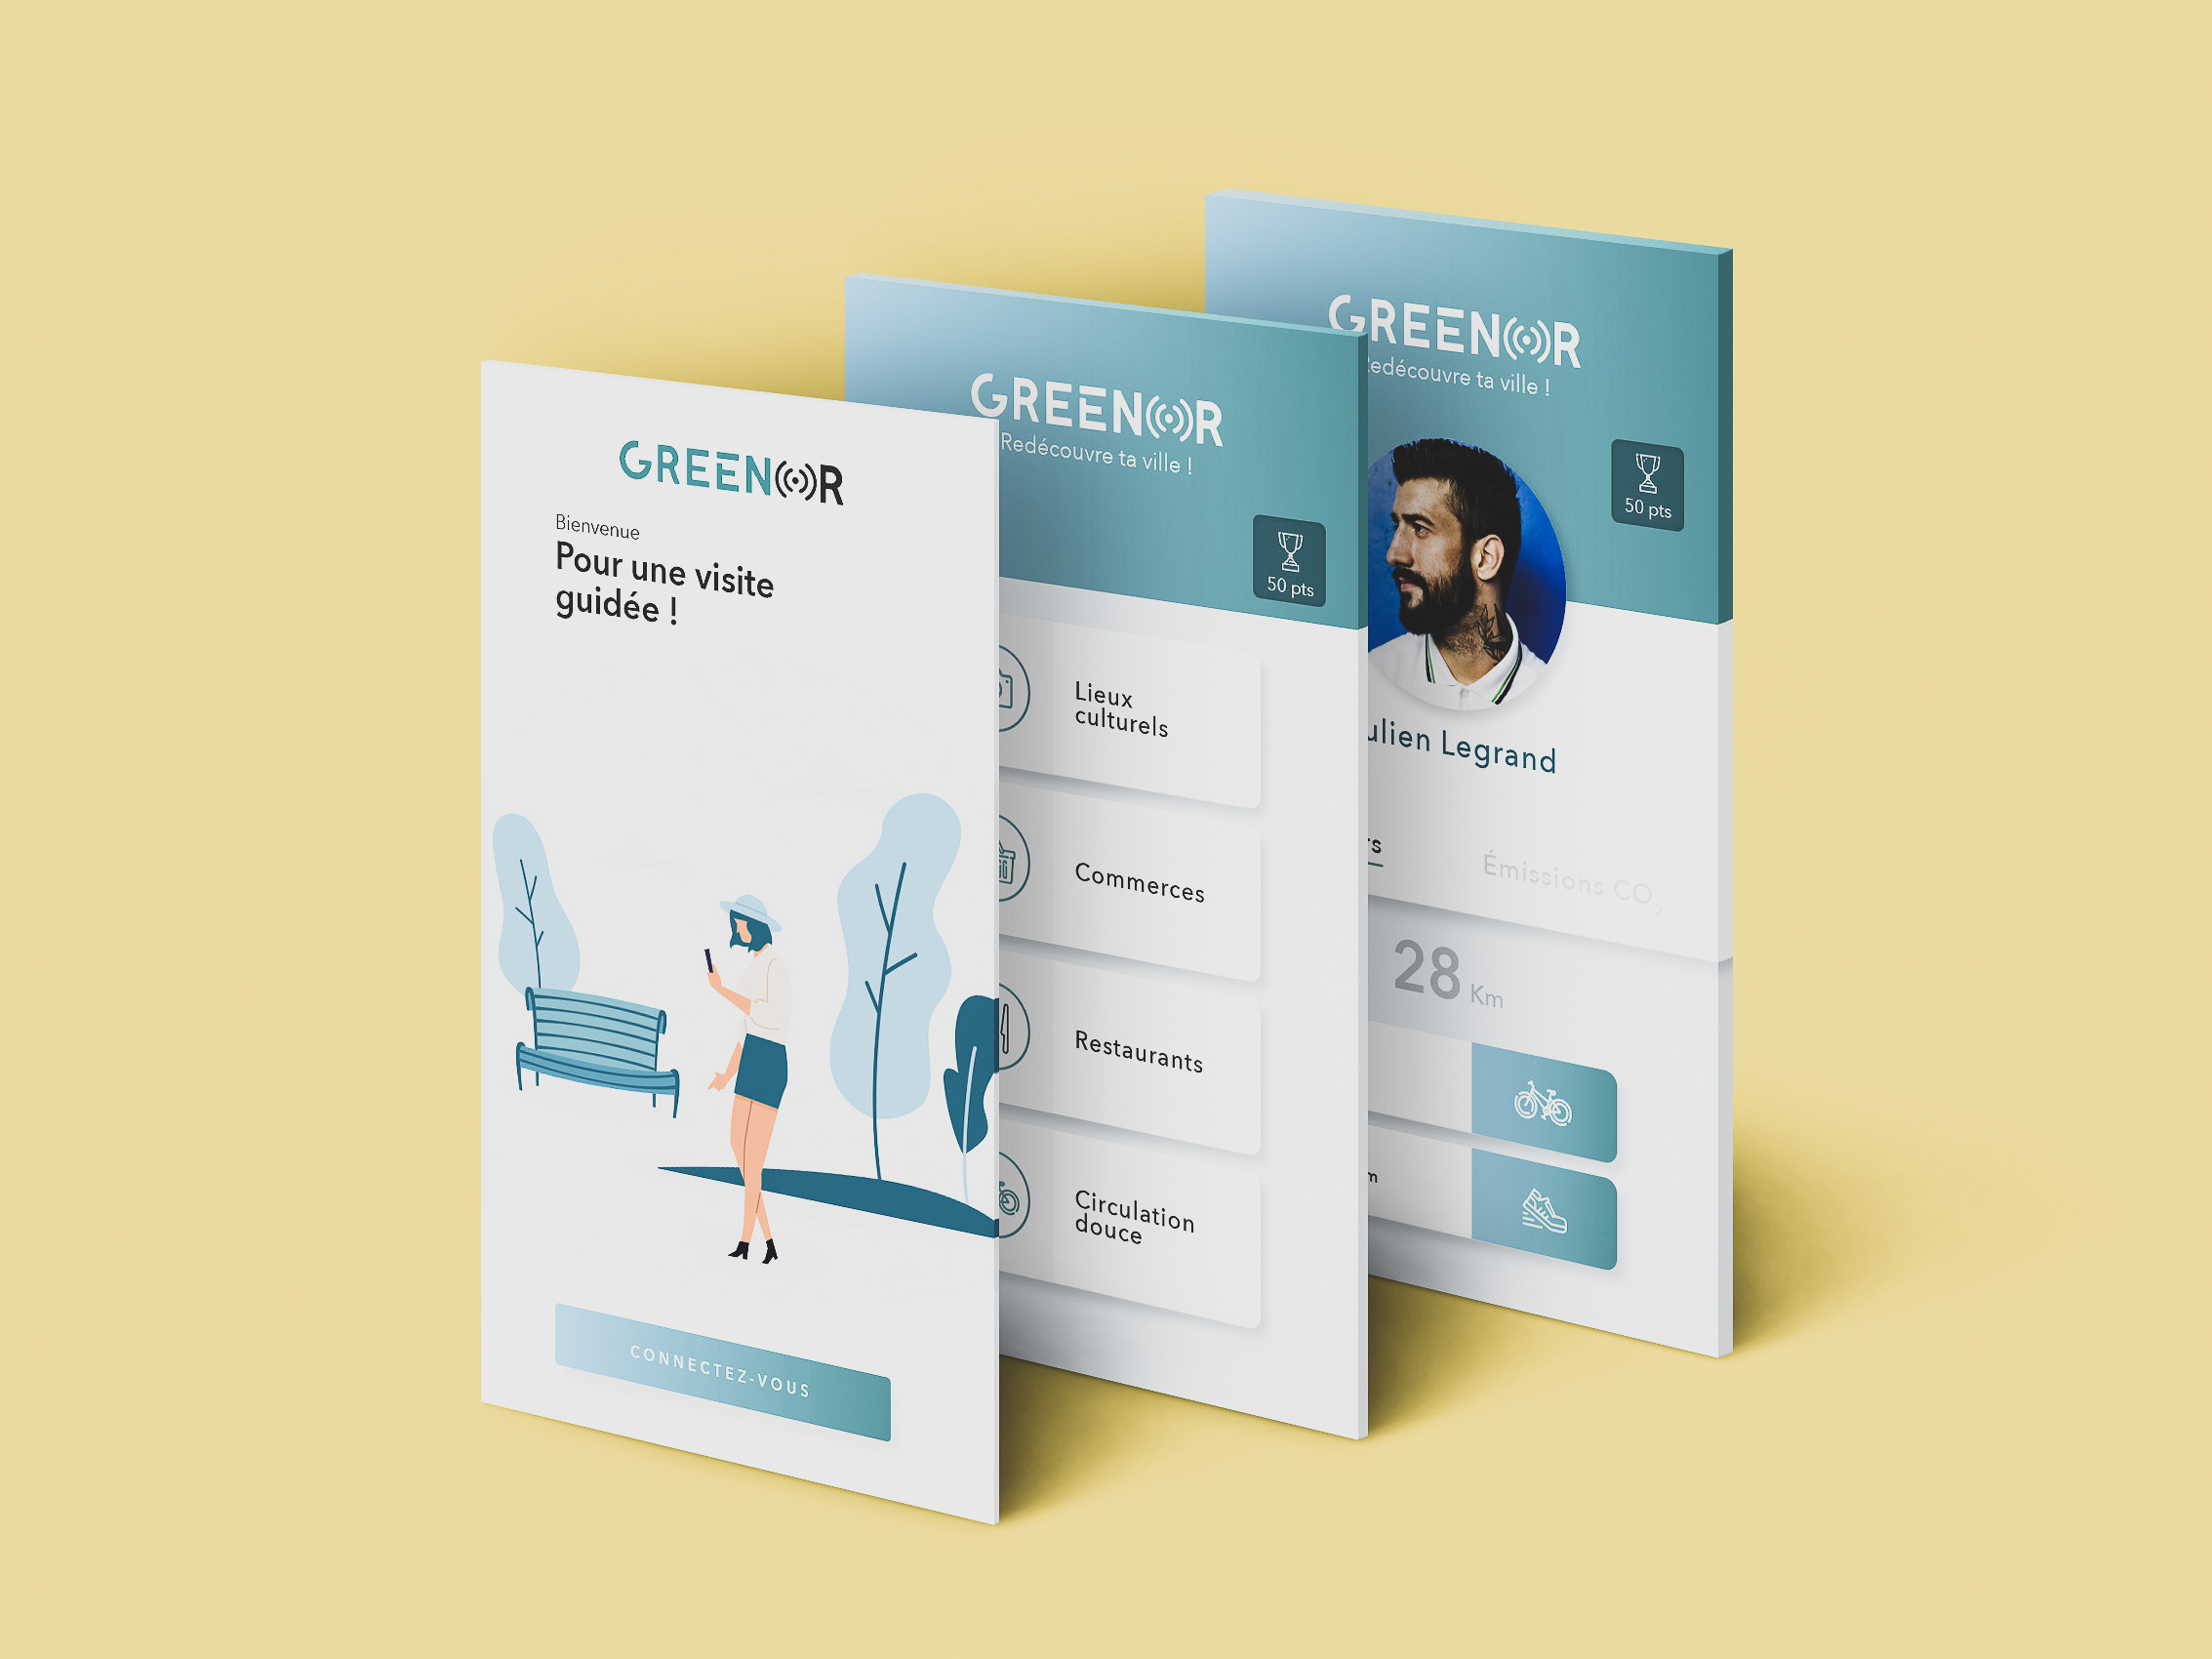 Projet-Hakathon-GreenOr-UX-design-Julia-Capdebos-2.jpg